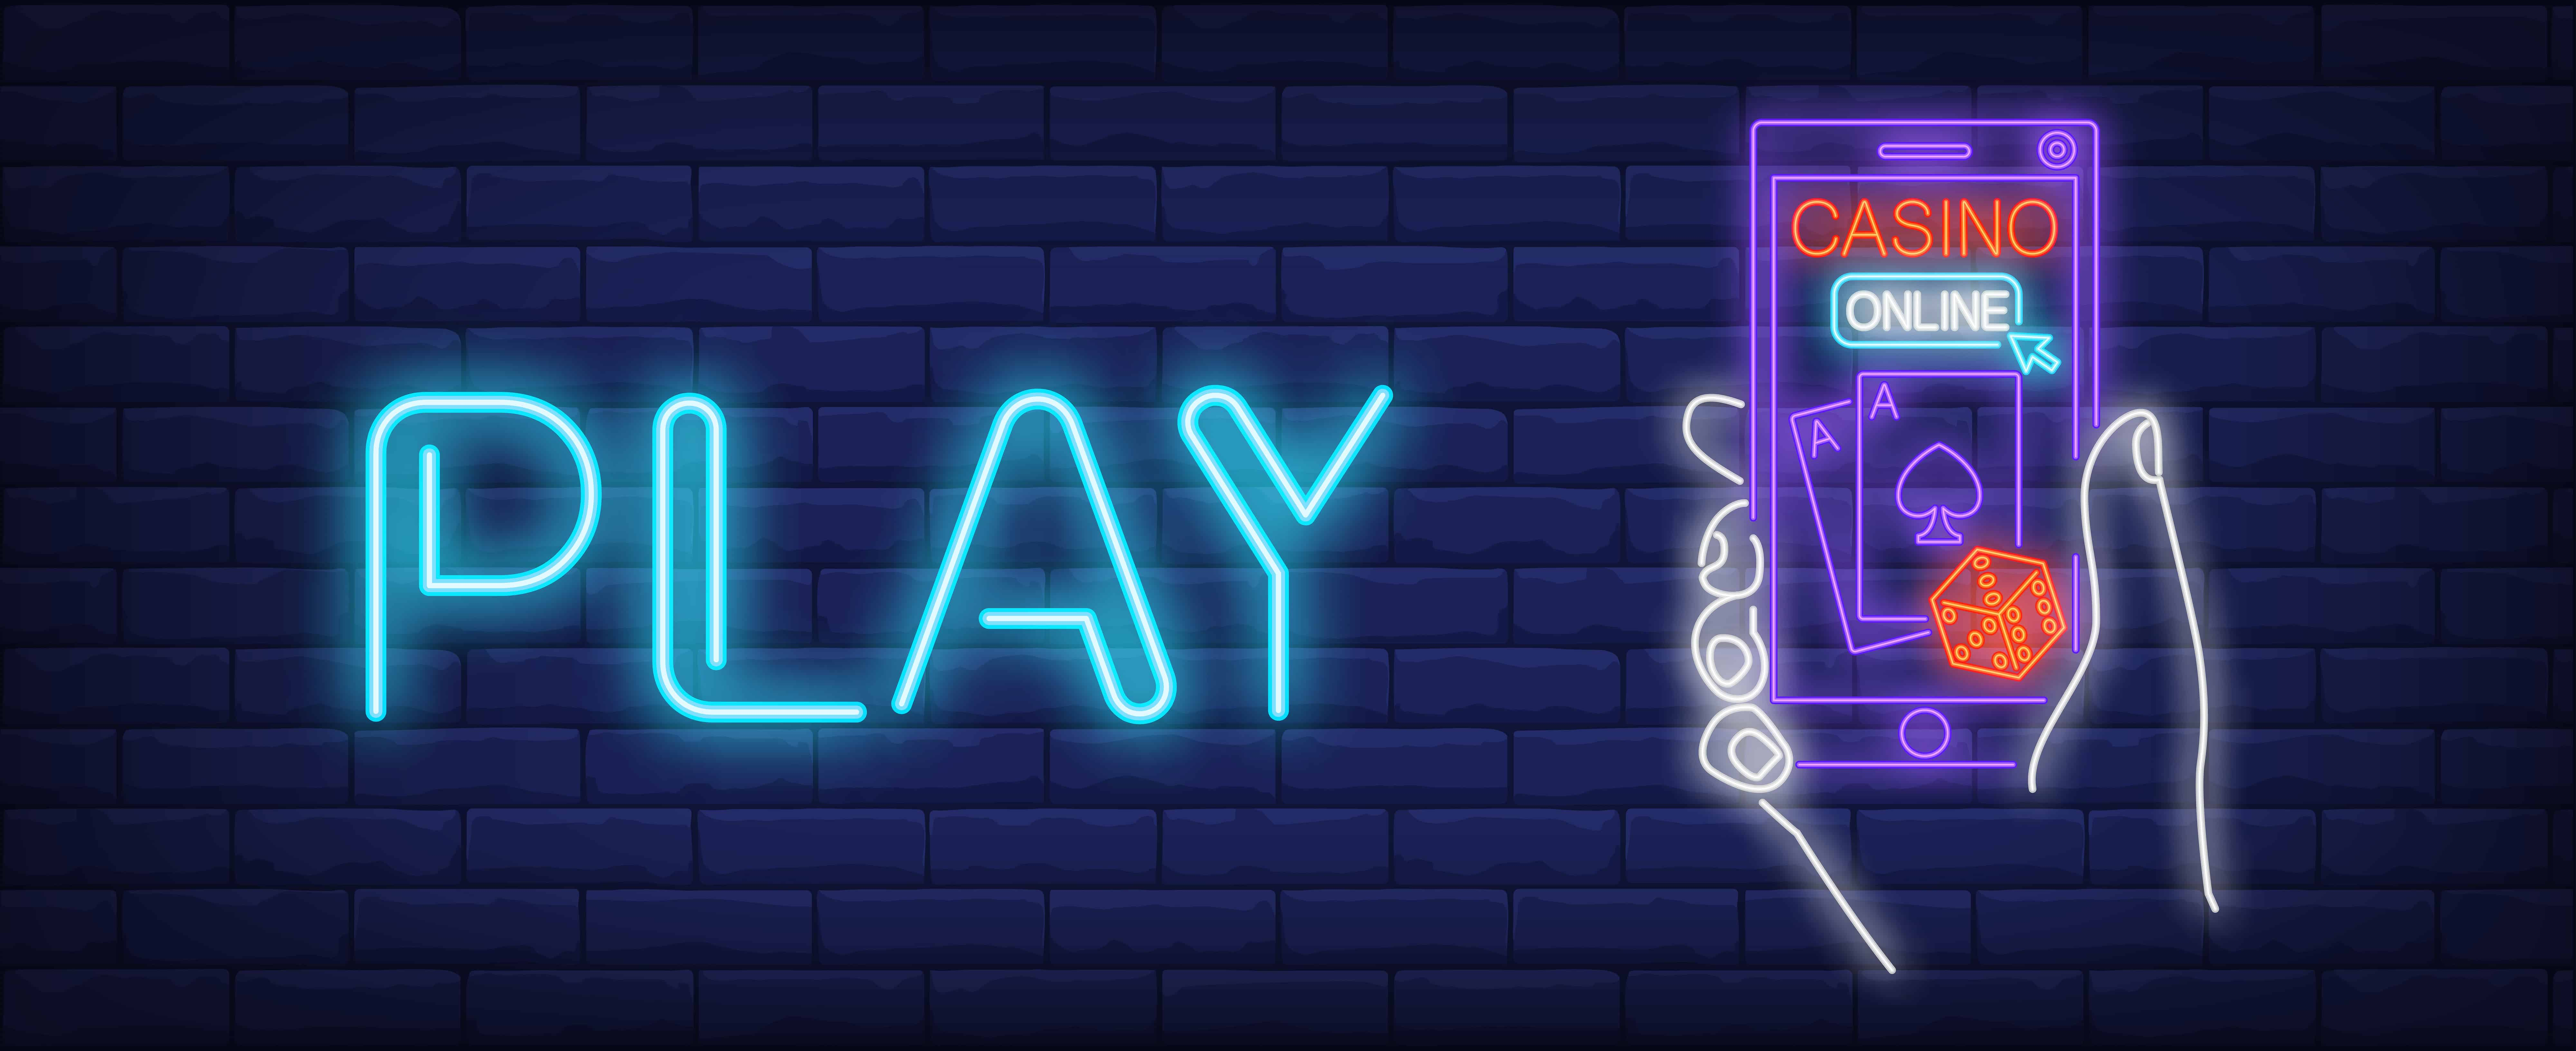 jogos Ipad online casino 2018